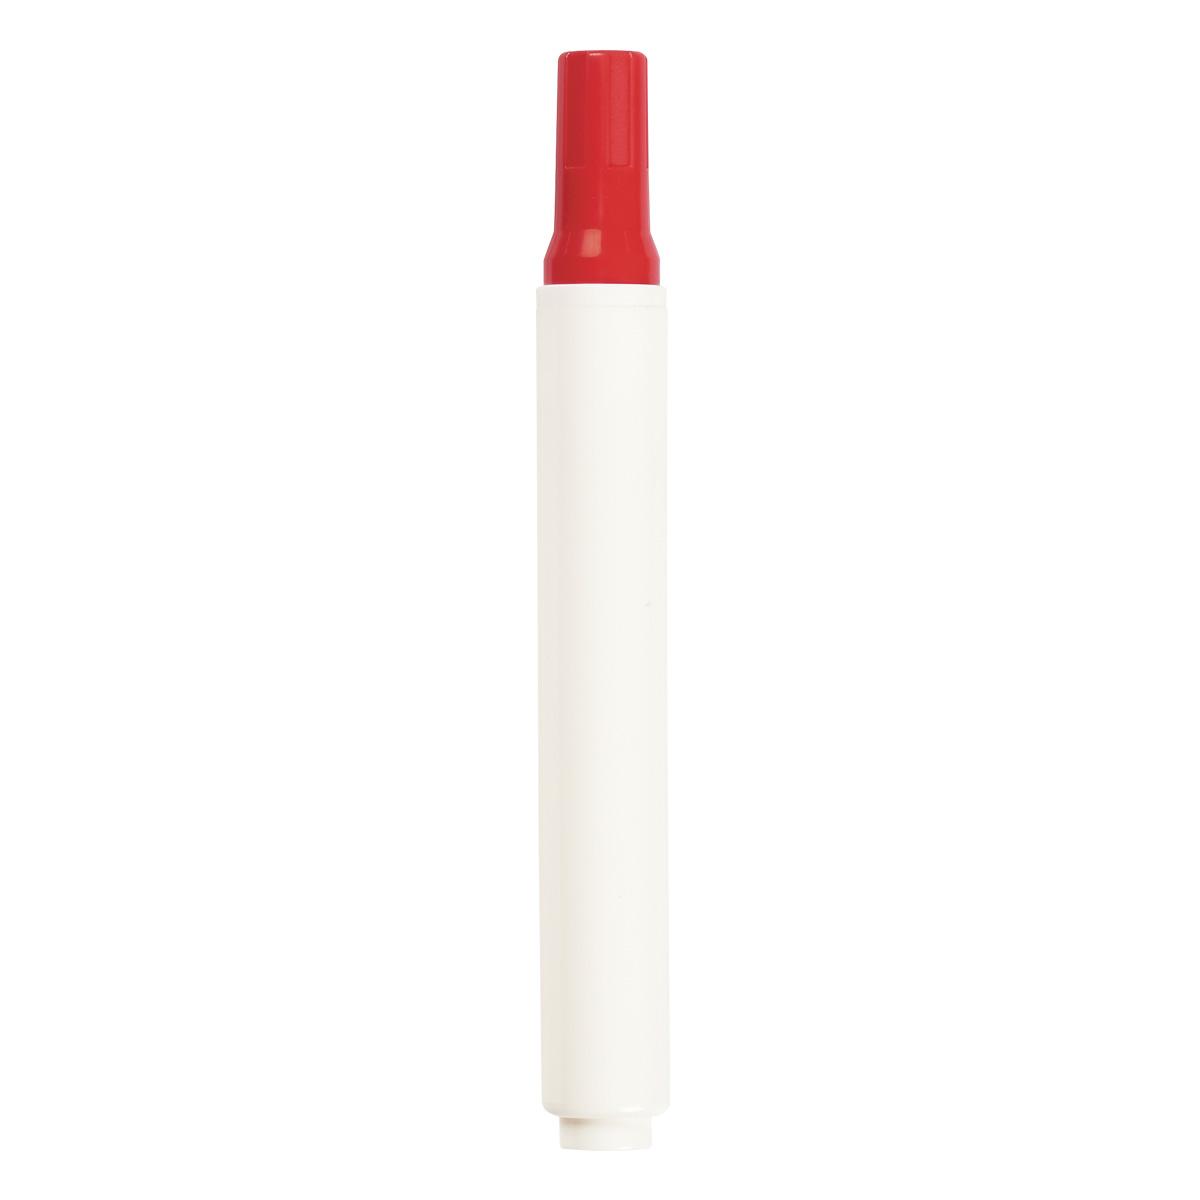 33 oz stain remover pen